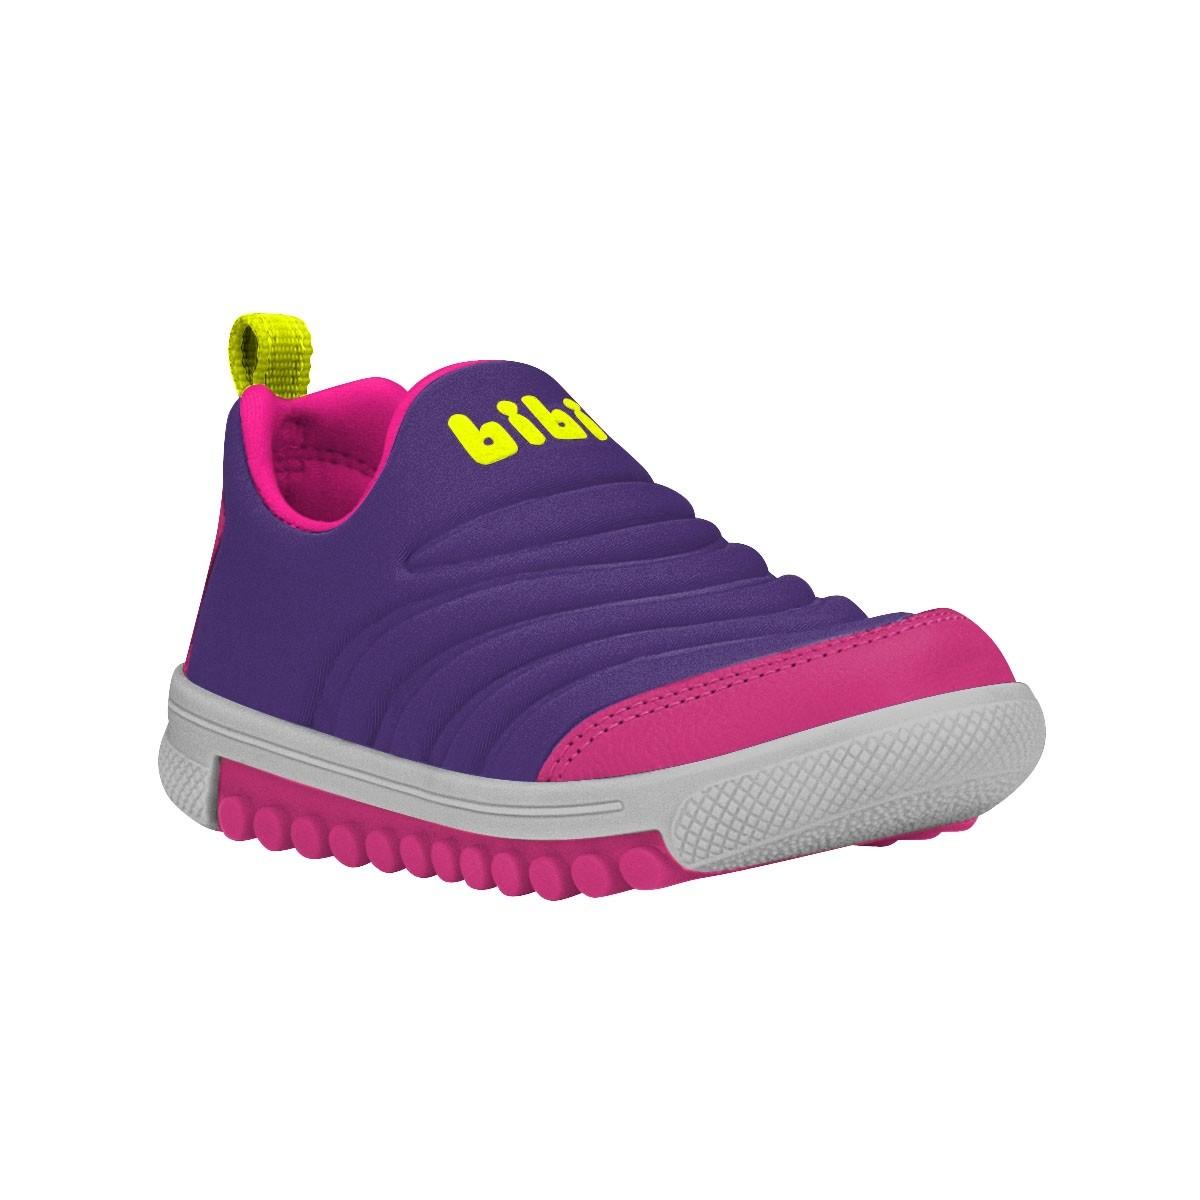 33e97cc3ed2 Bizz Store - Tênis Infantil Feminino Bibi Roller New Roxo Pink